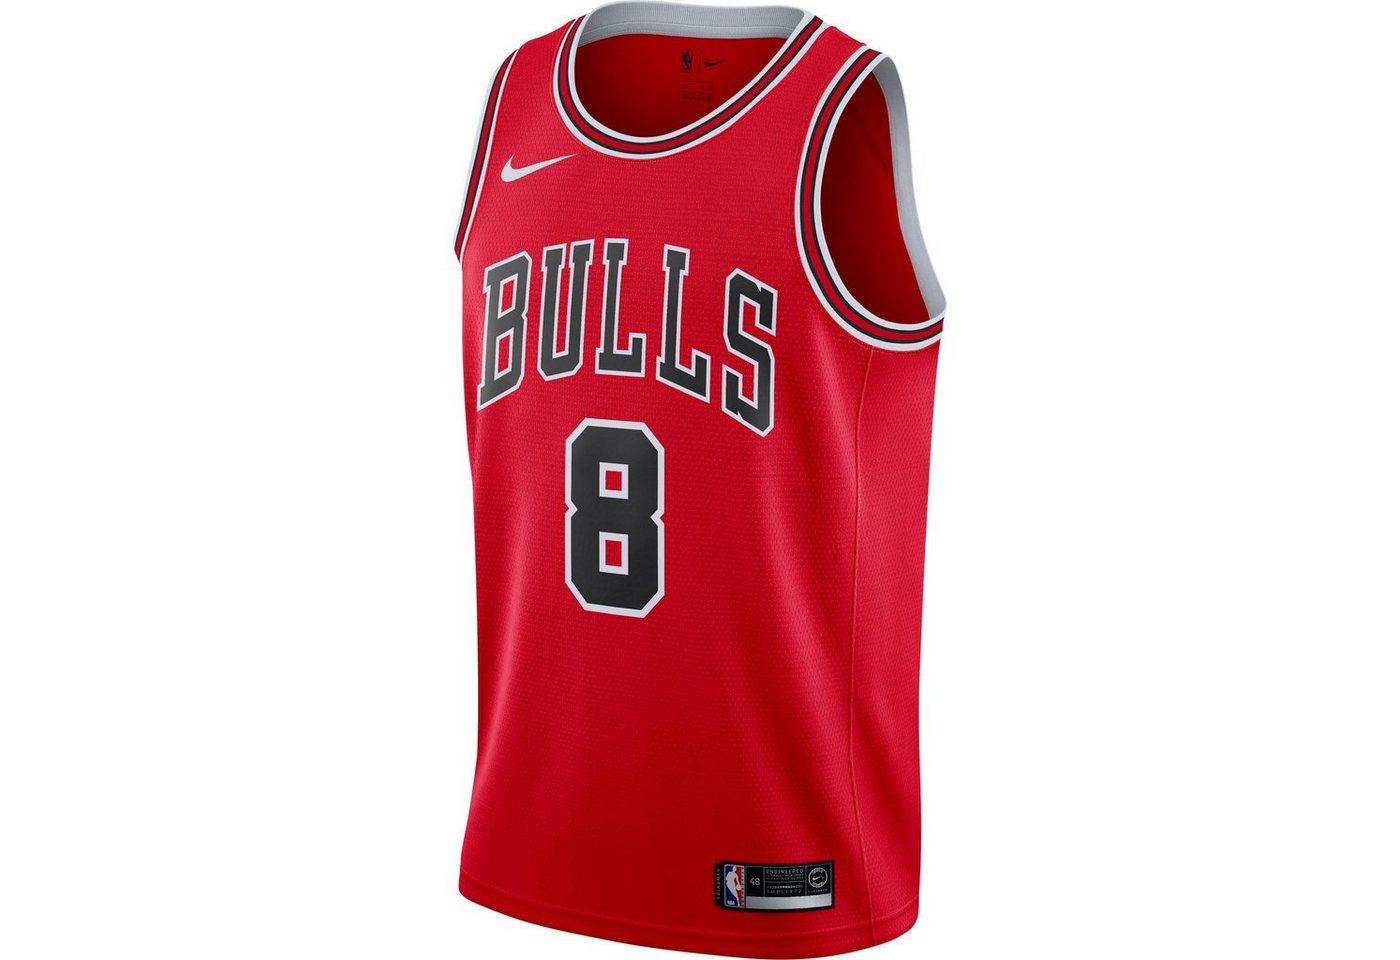 Nike Basketballtrikot »Zach Lavine Chicago Bulls«   Sportbekleidung > Trikots > Basketballtrikots   Rot   Trikot   Nike